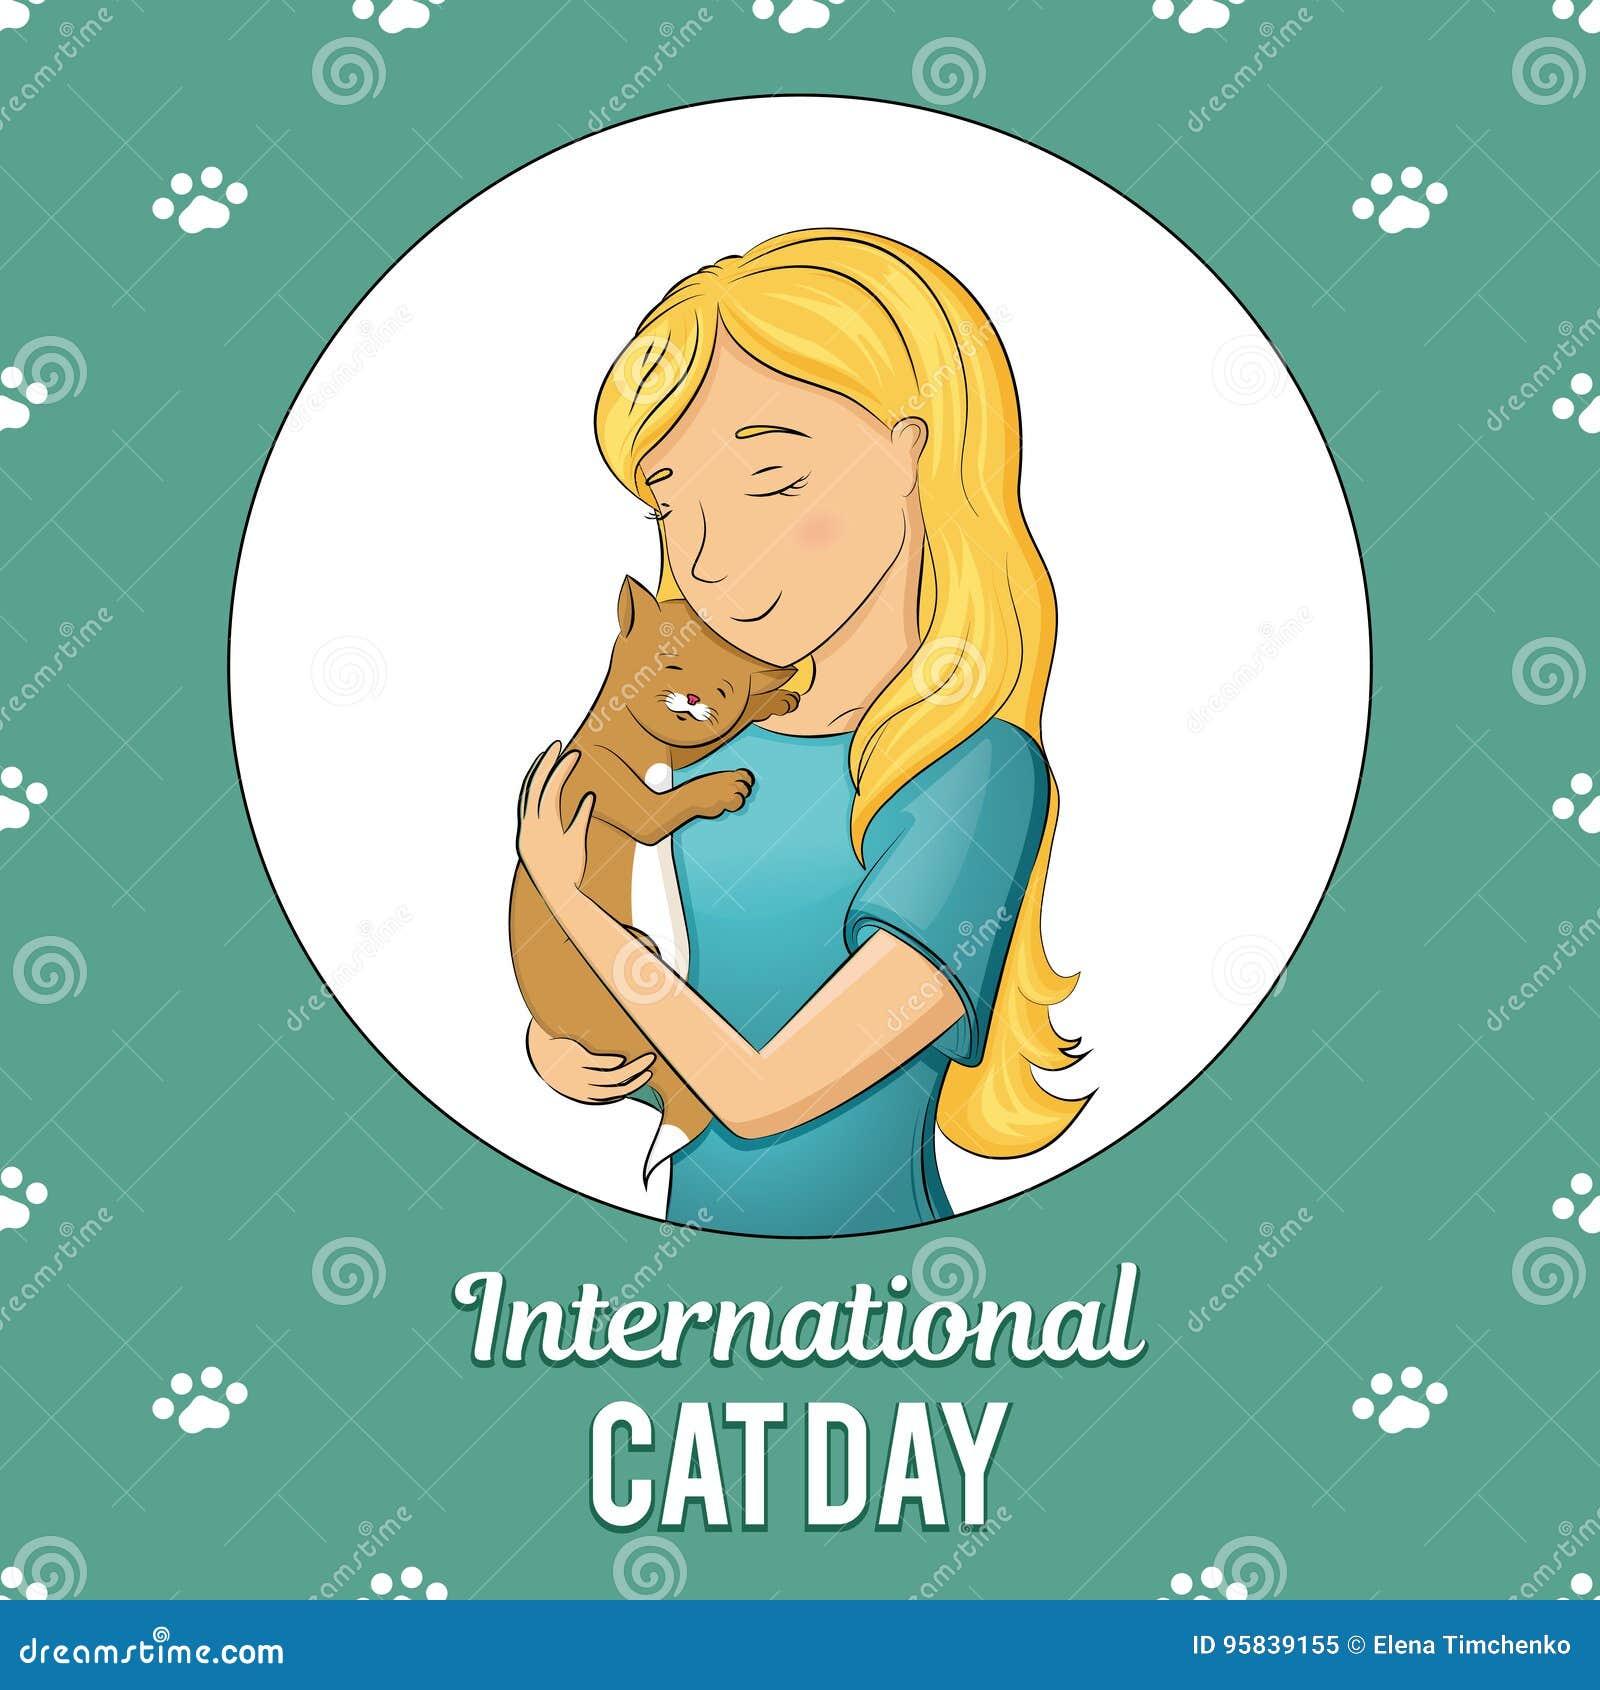 Cat Day International Stock Illustrations 888 Cat Day International Stock Illustrations Vectors Clipart Dreamstime